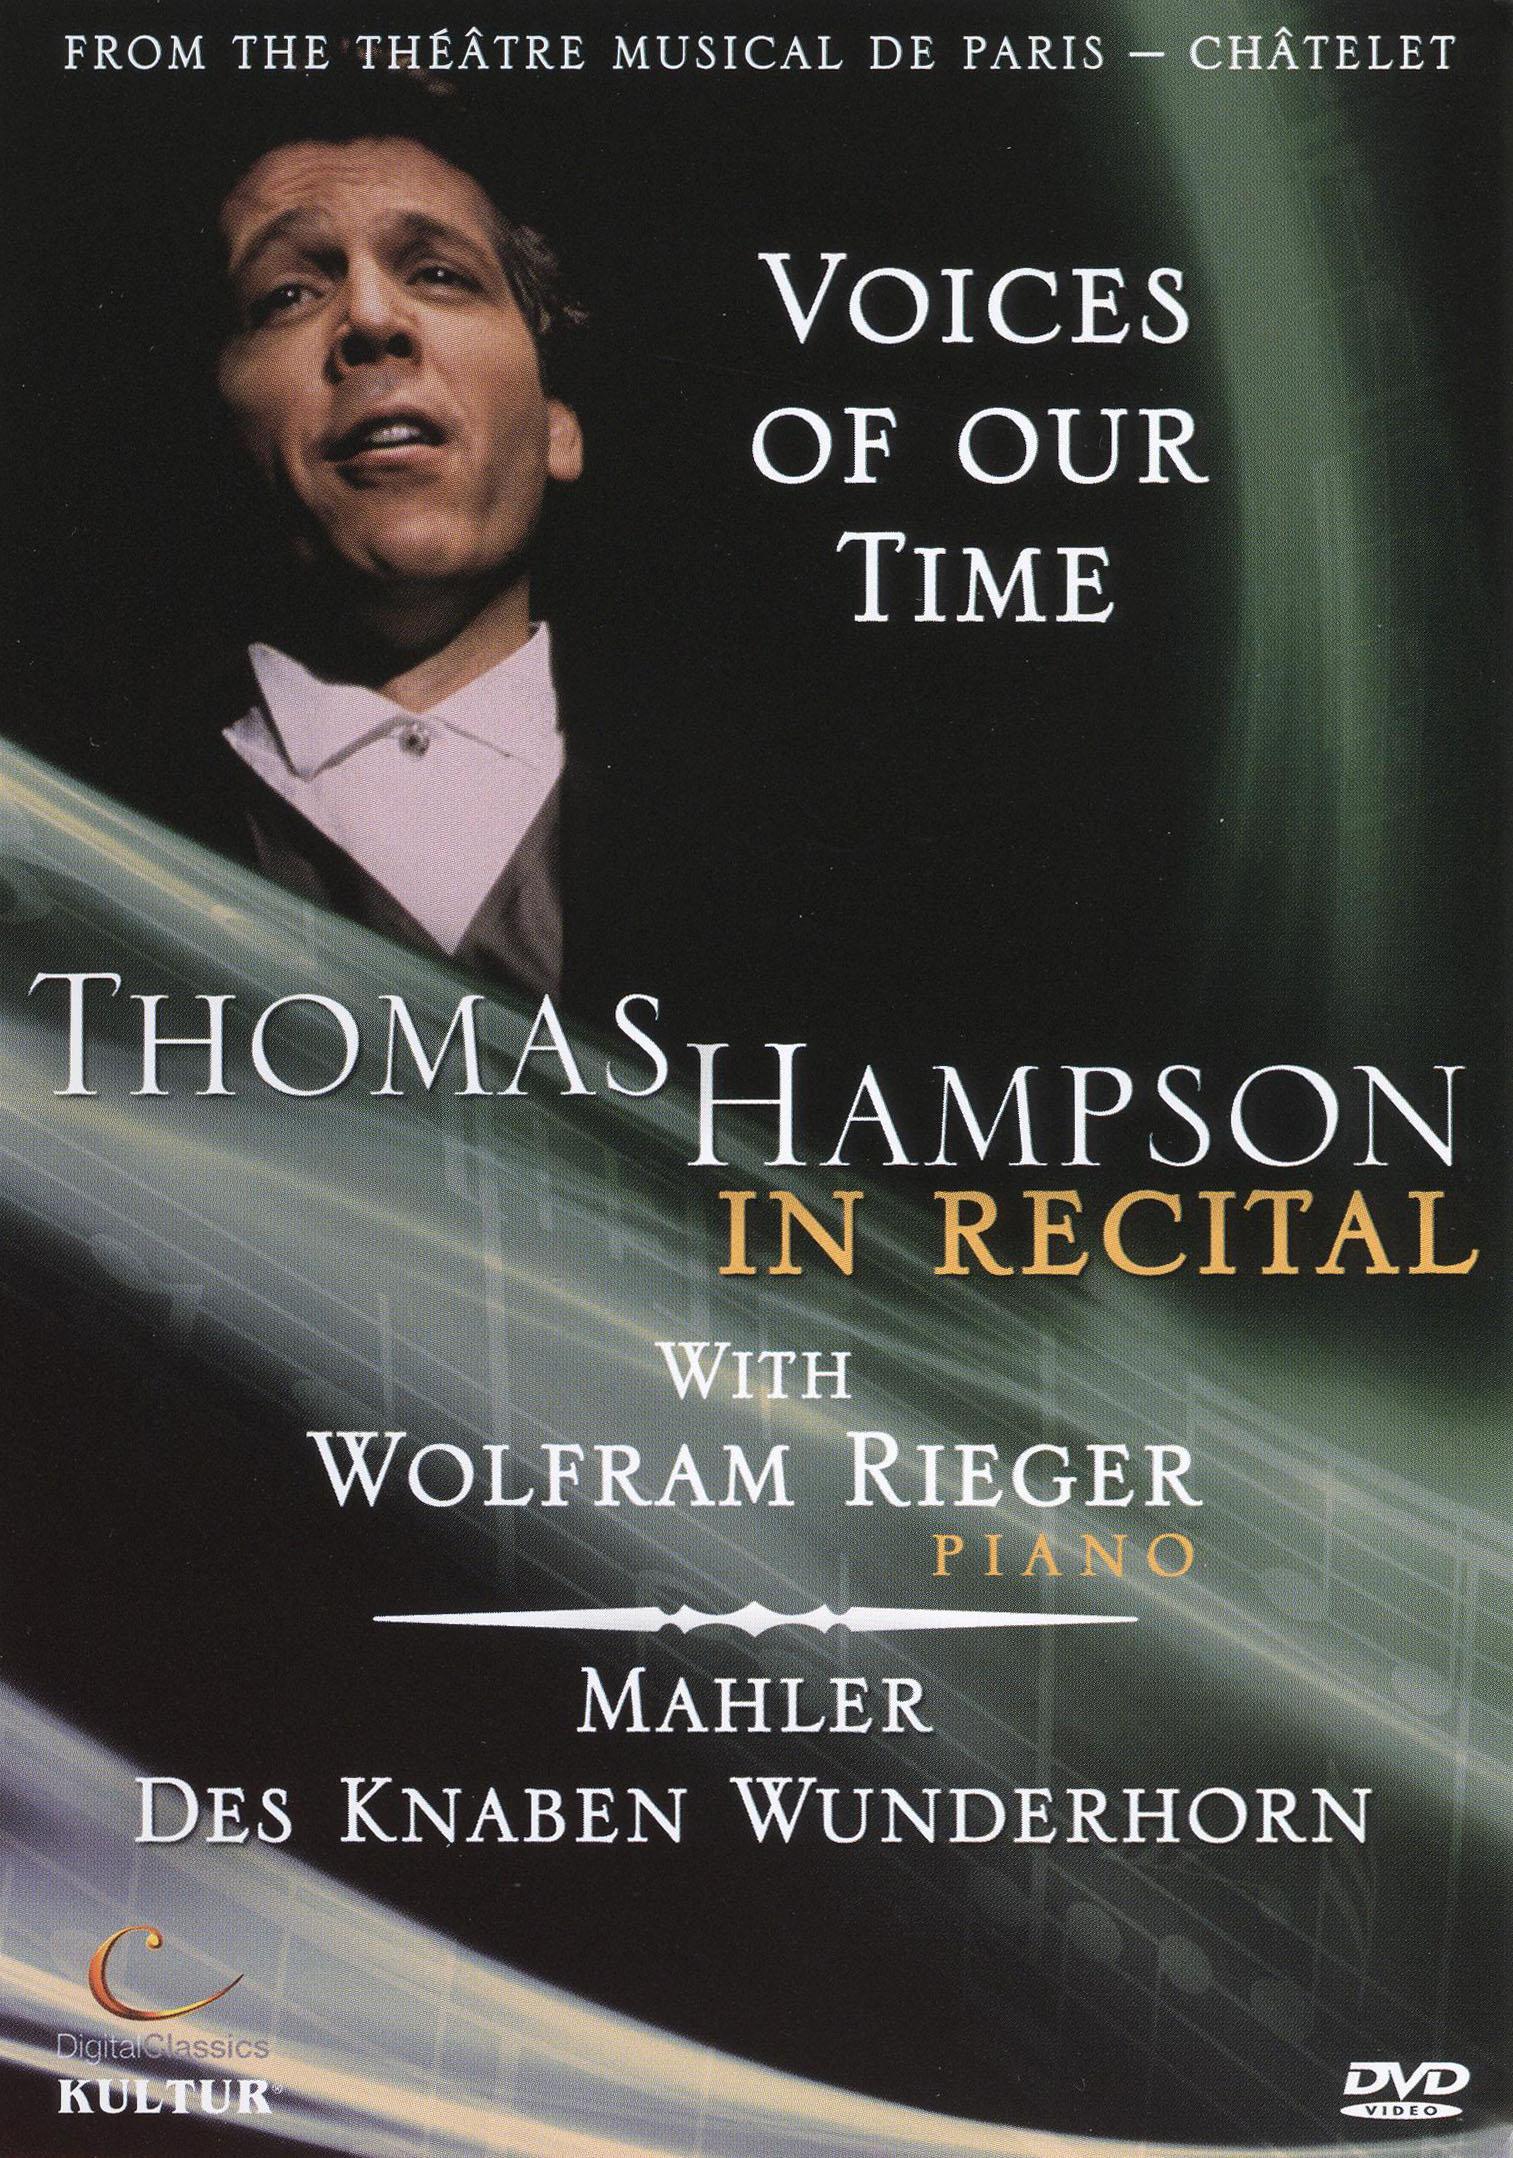 Voices of Our Time: Thomas Hampson